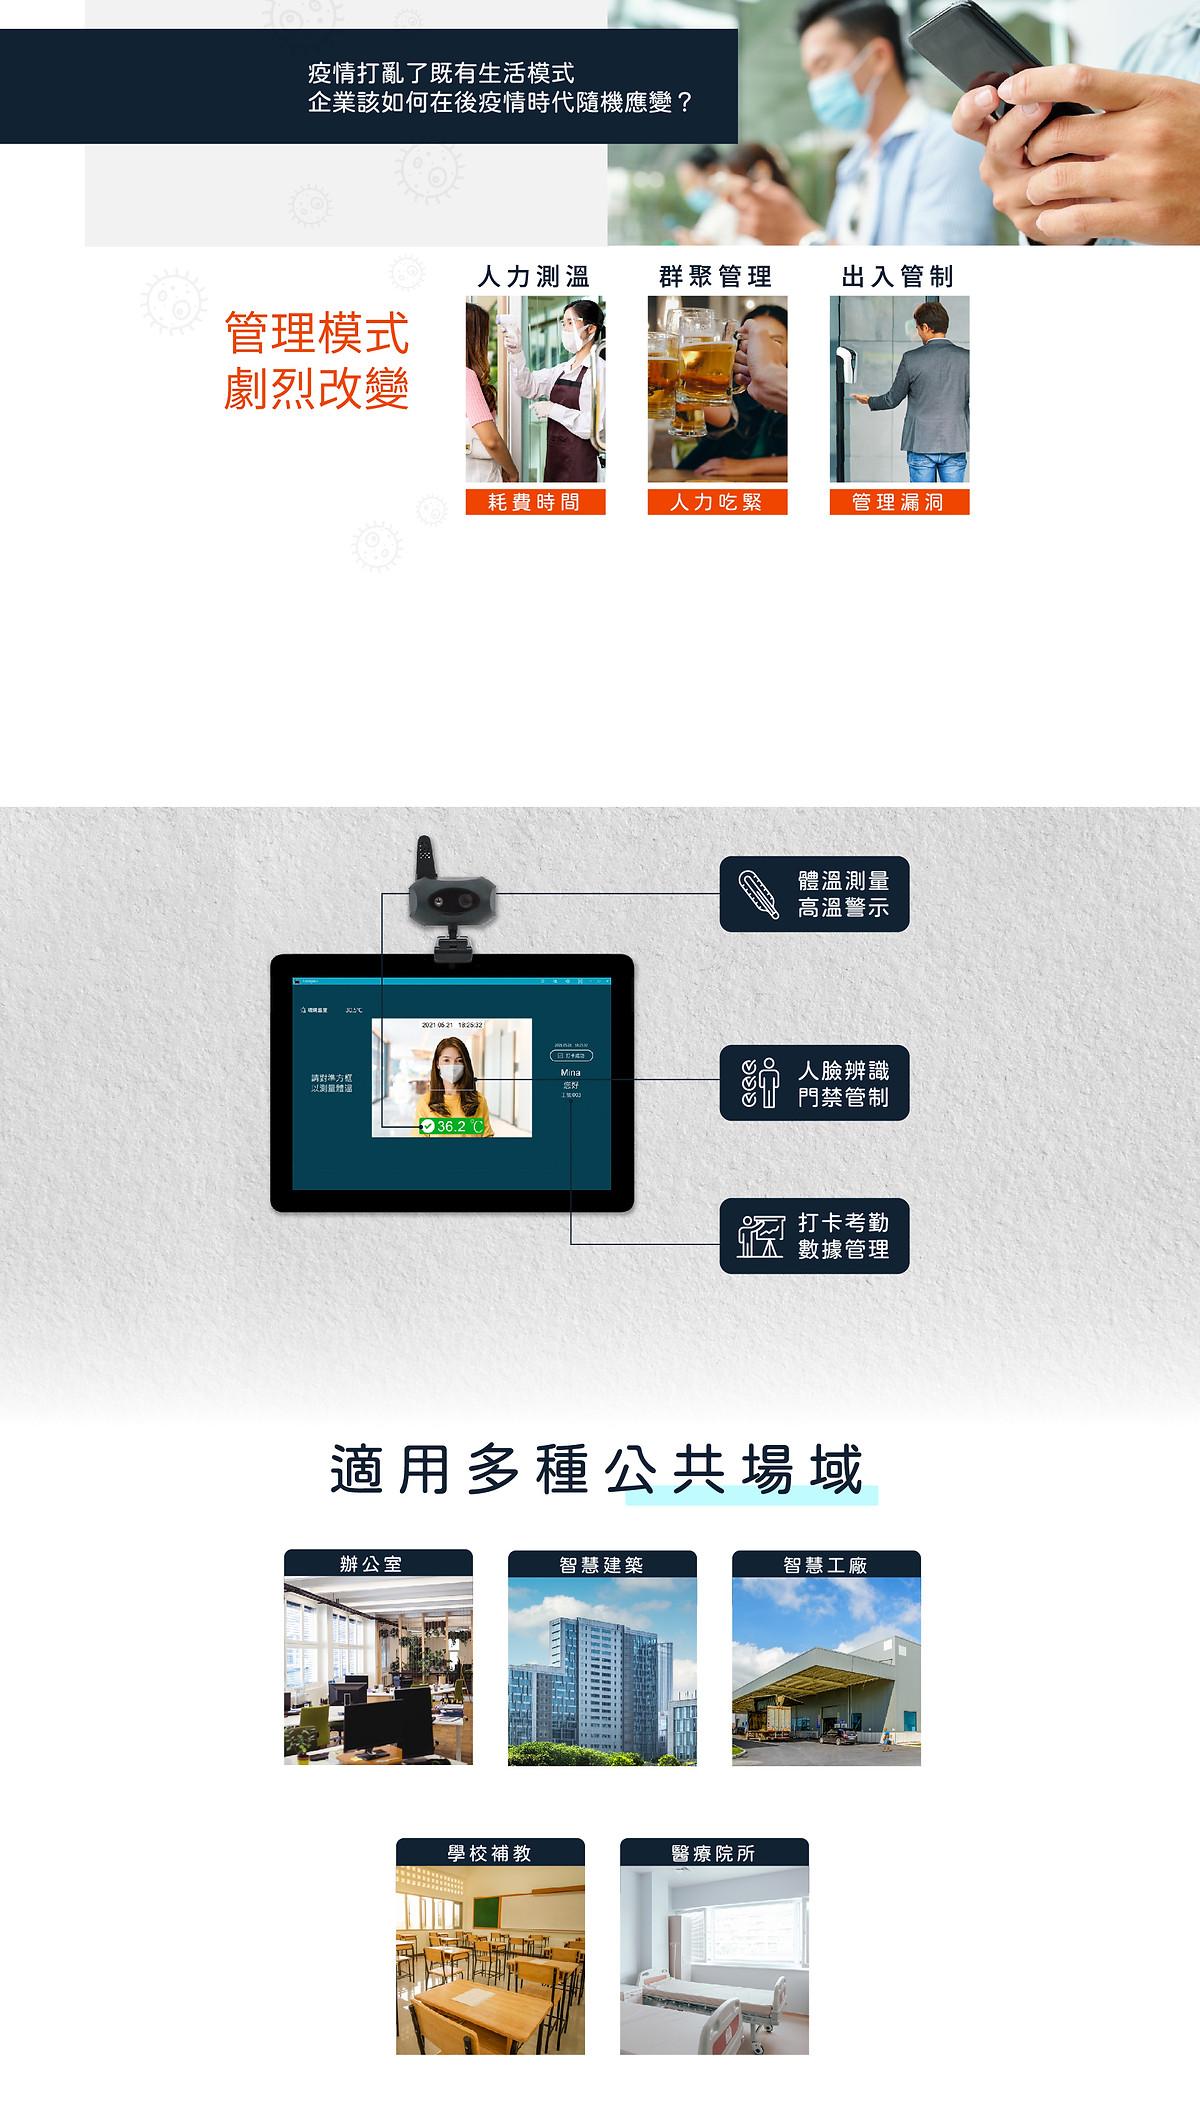 SurfaceGo EDM_2版(網頁)_2.jpg